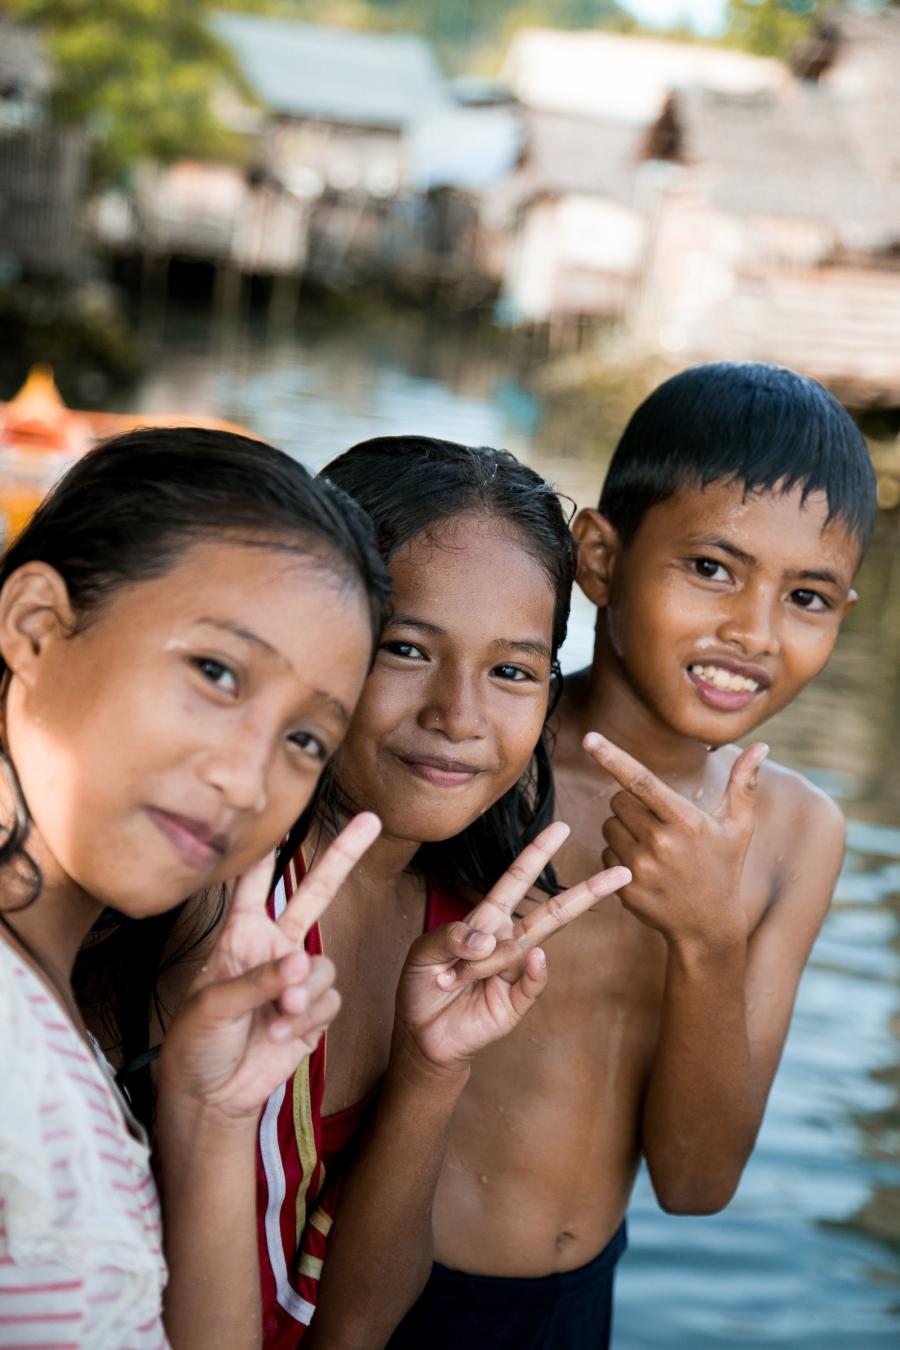 FILIPINAS - ARGAZKI MAHATU, Photography & films.